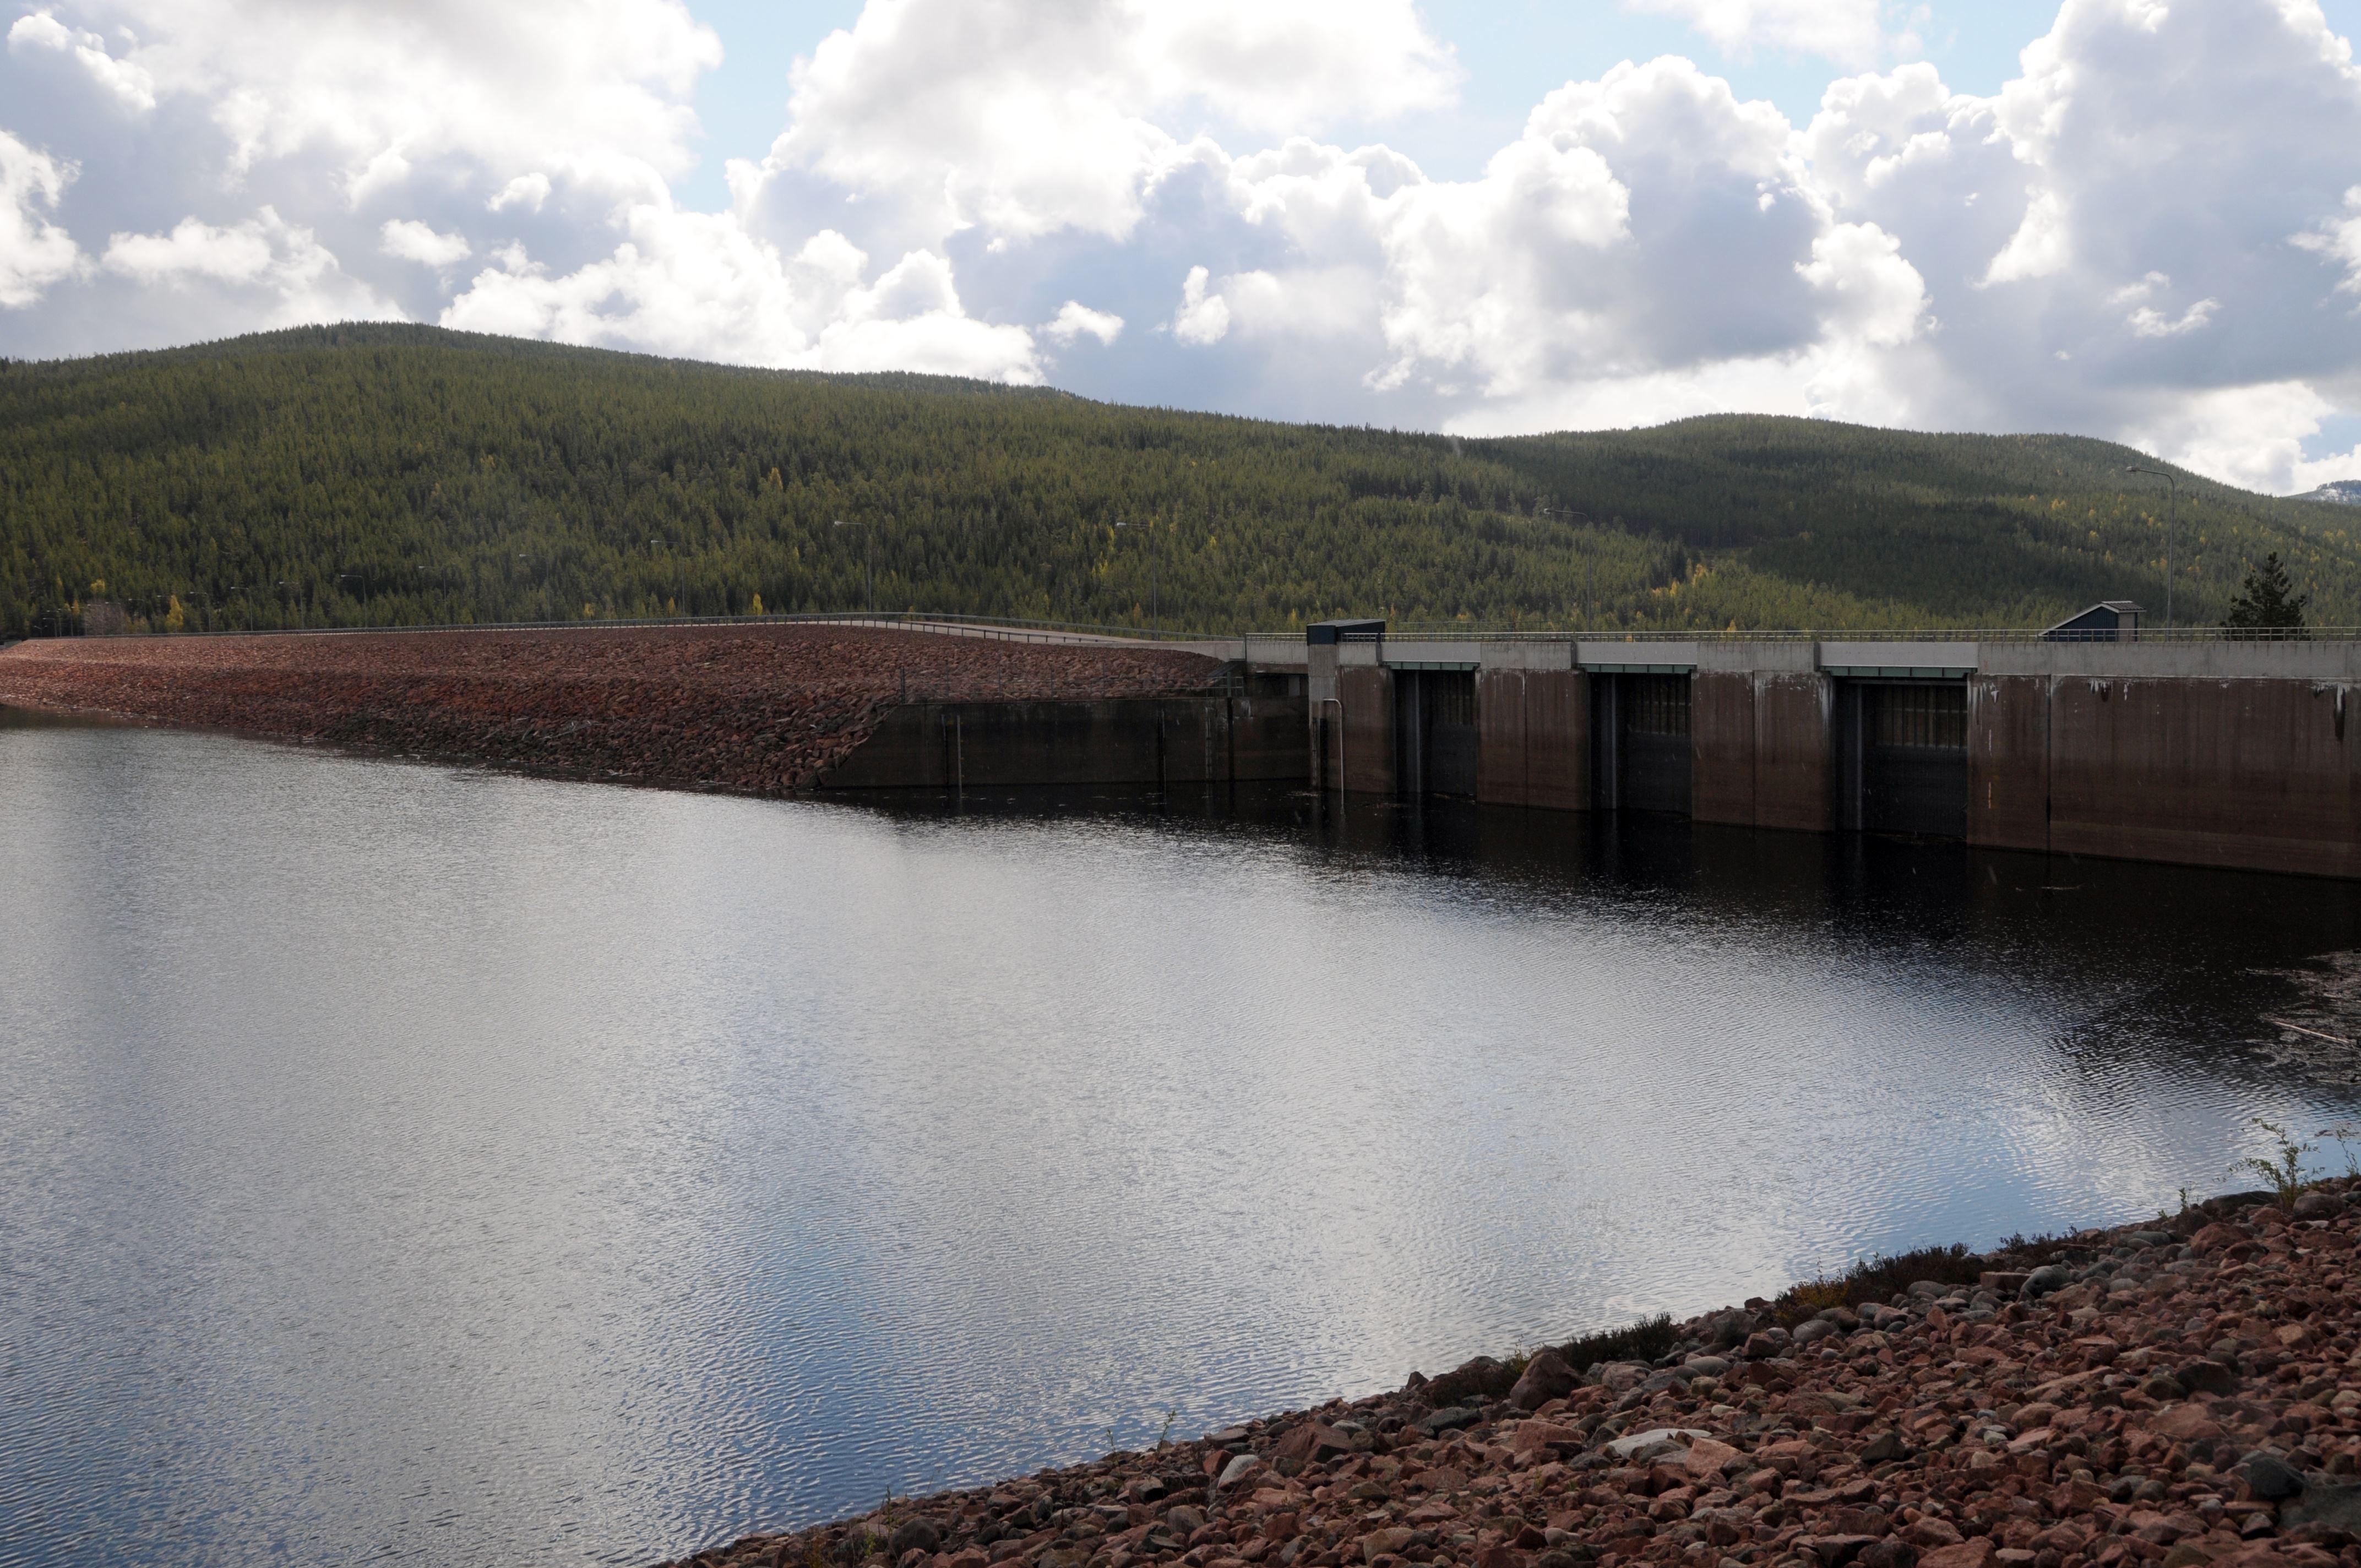 Nisse Schmidt, Trängslet - the dam